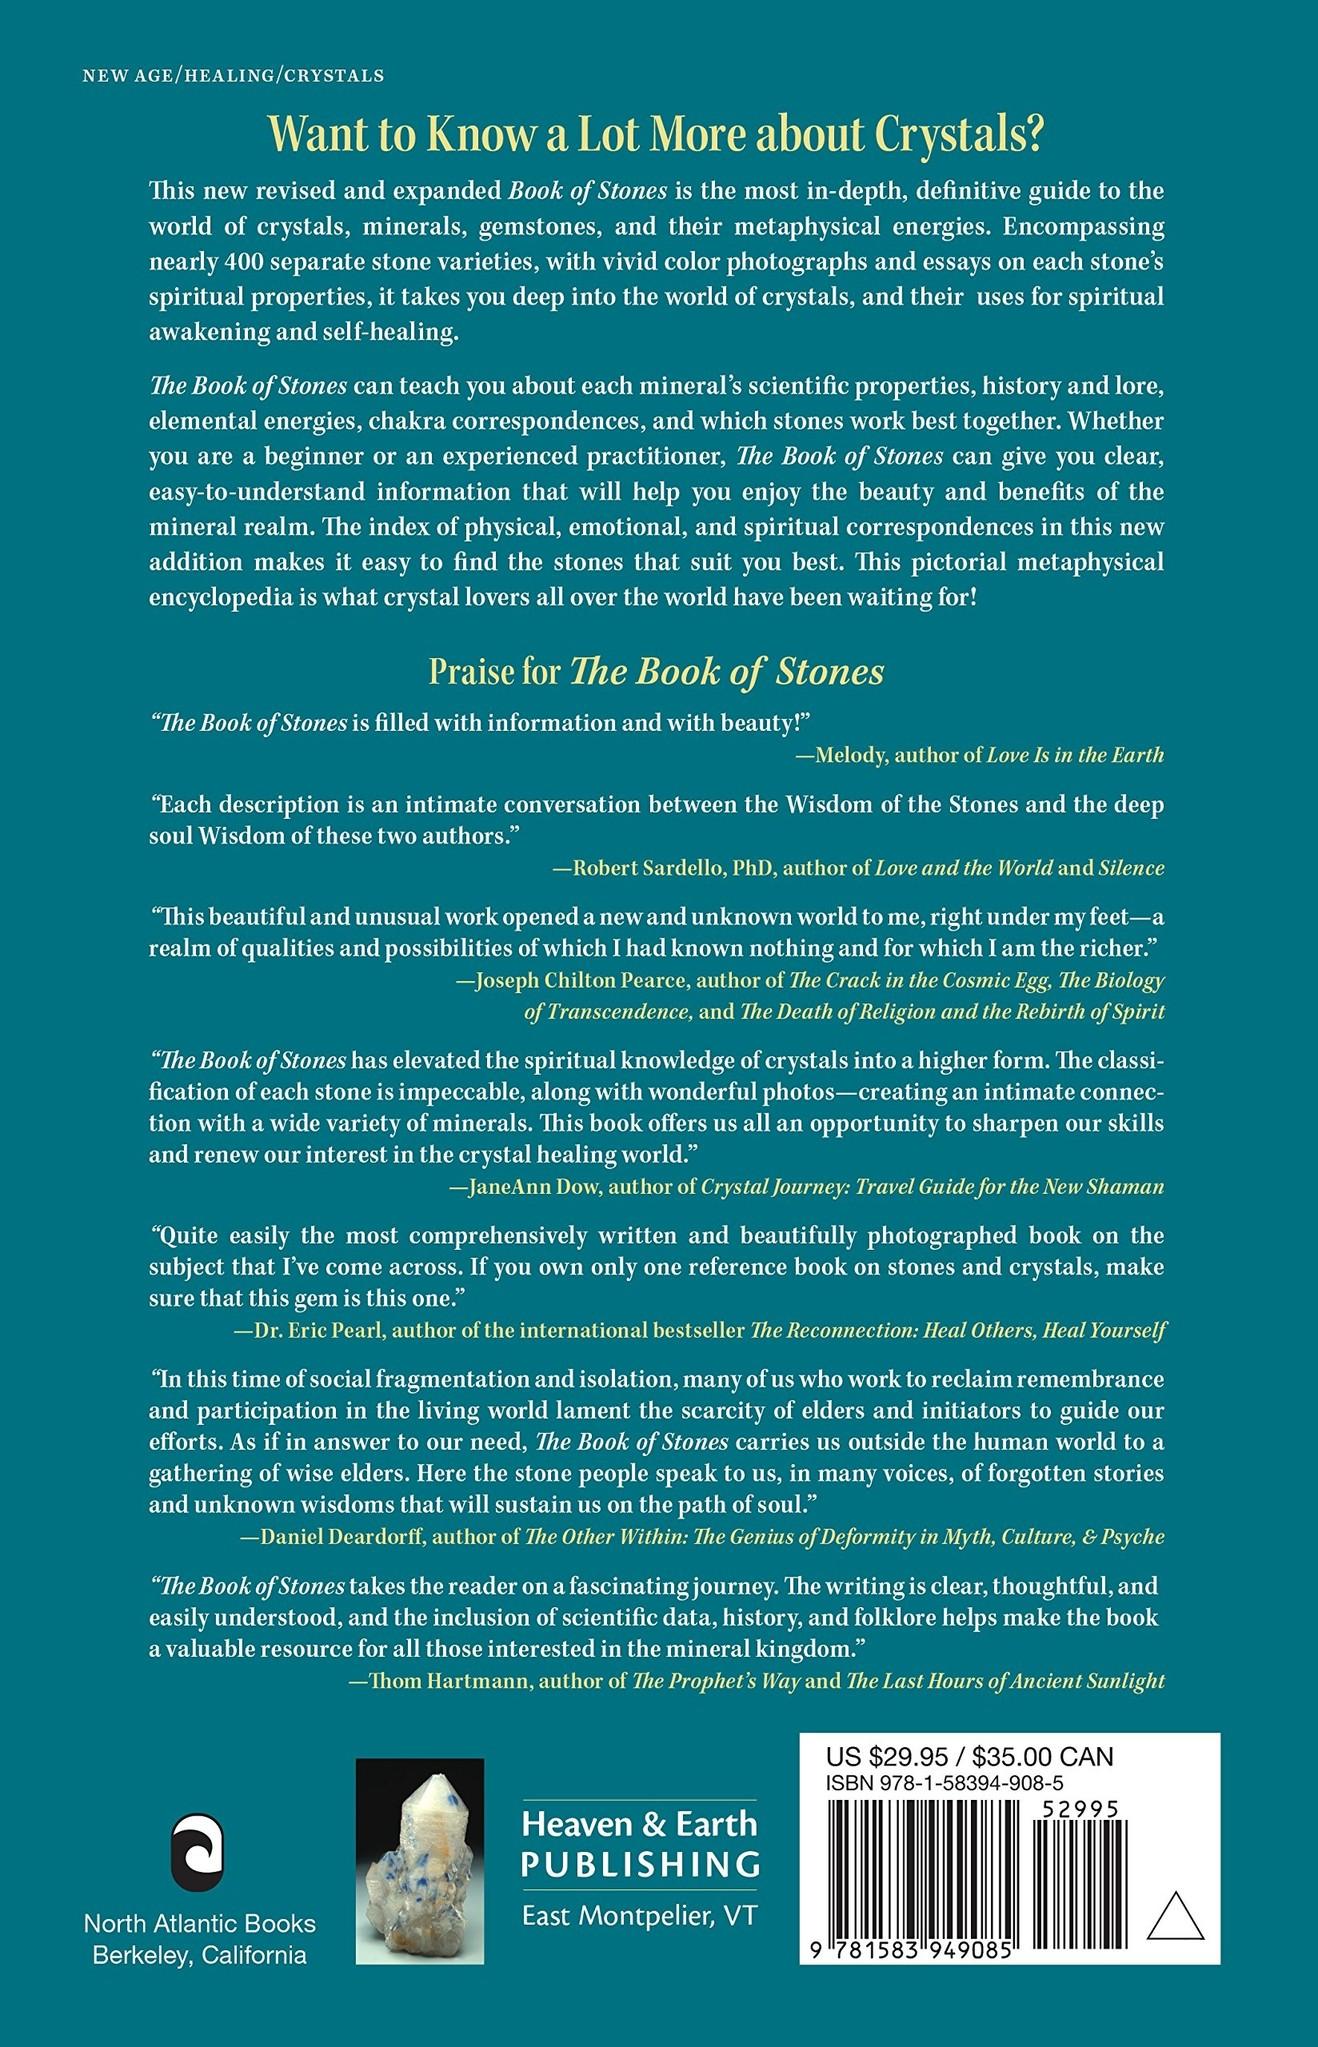 BOOK OF STONES BY ROBERT SIMMONS - PBK